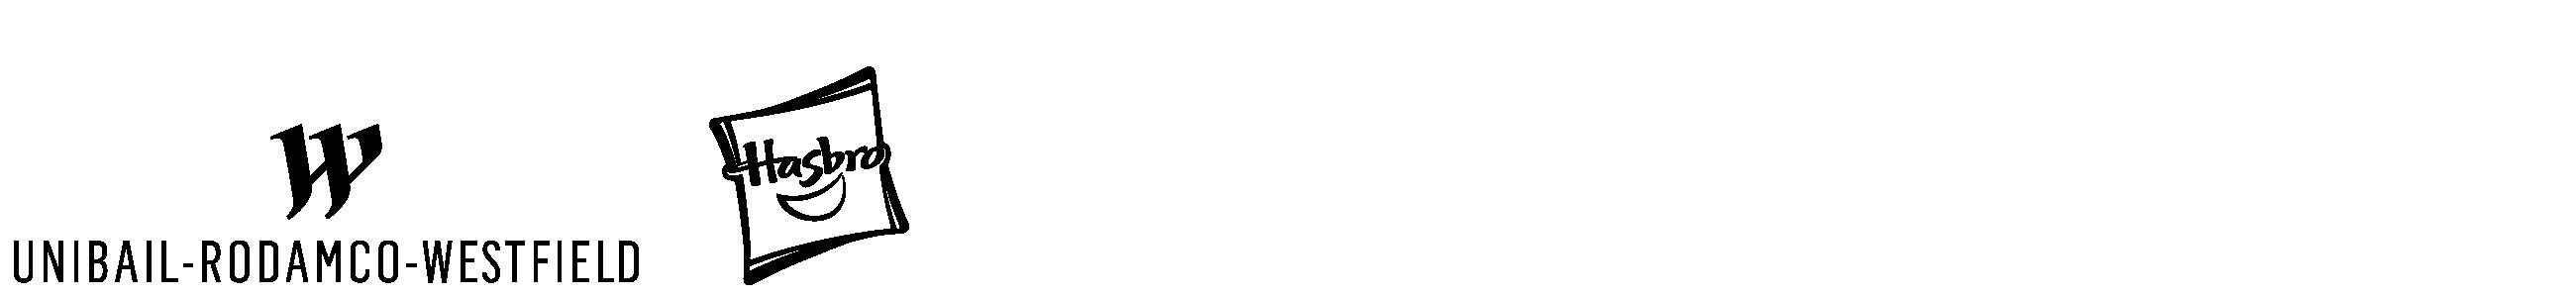 MADHOUSE – WEB_V3_MONOPOLY – CLIENTES